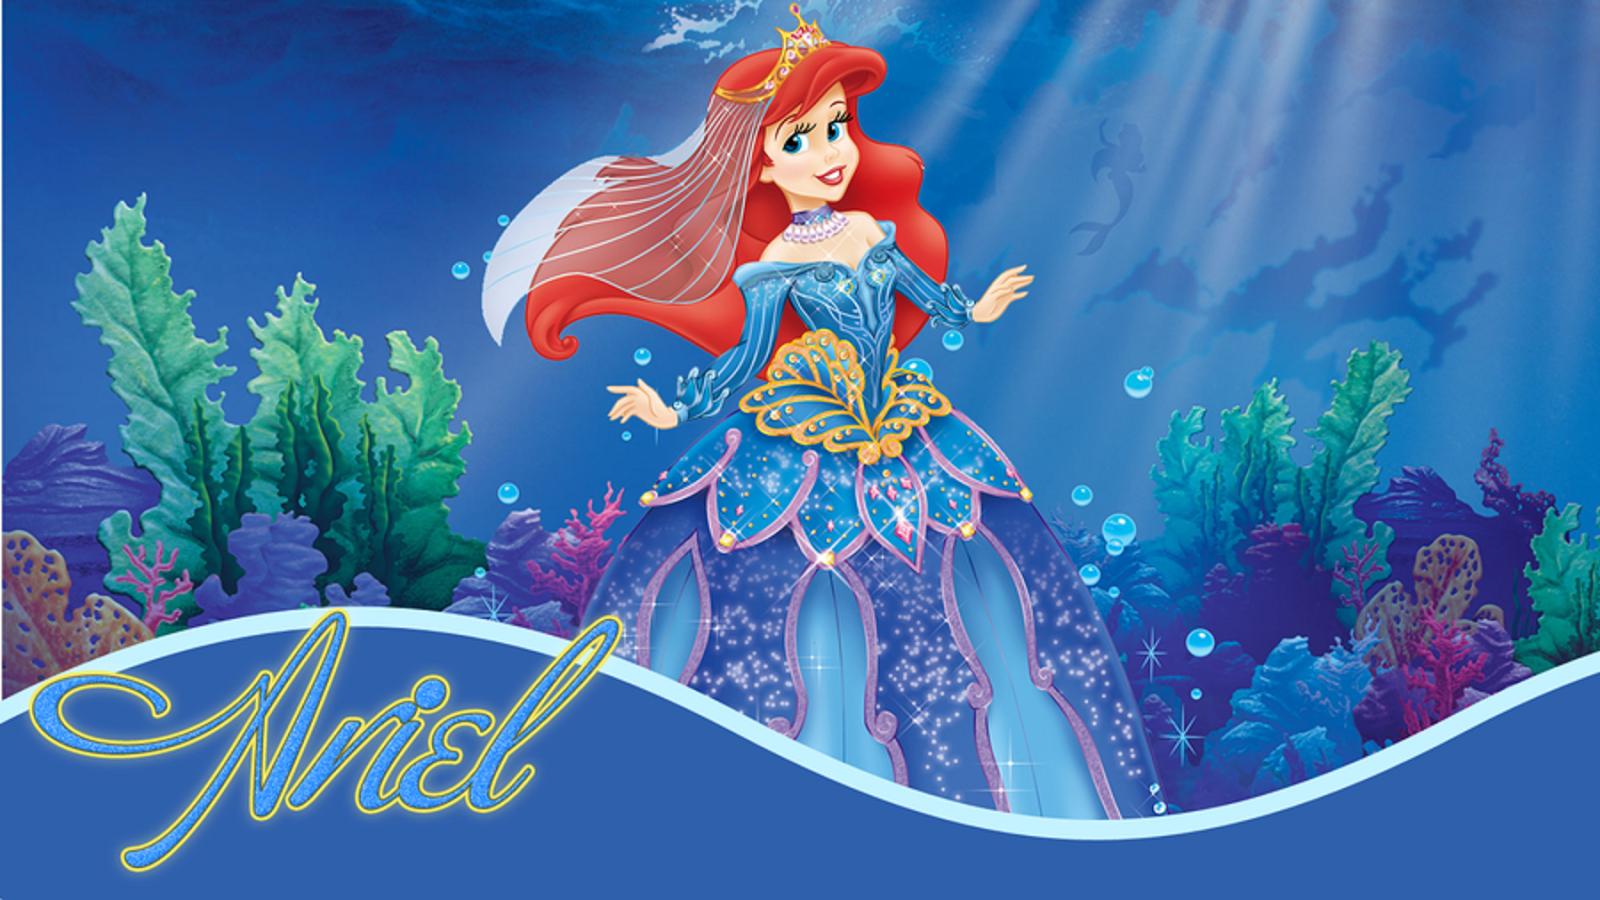 Disney Wallpaper Hd Download 1600x900